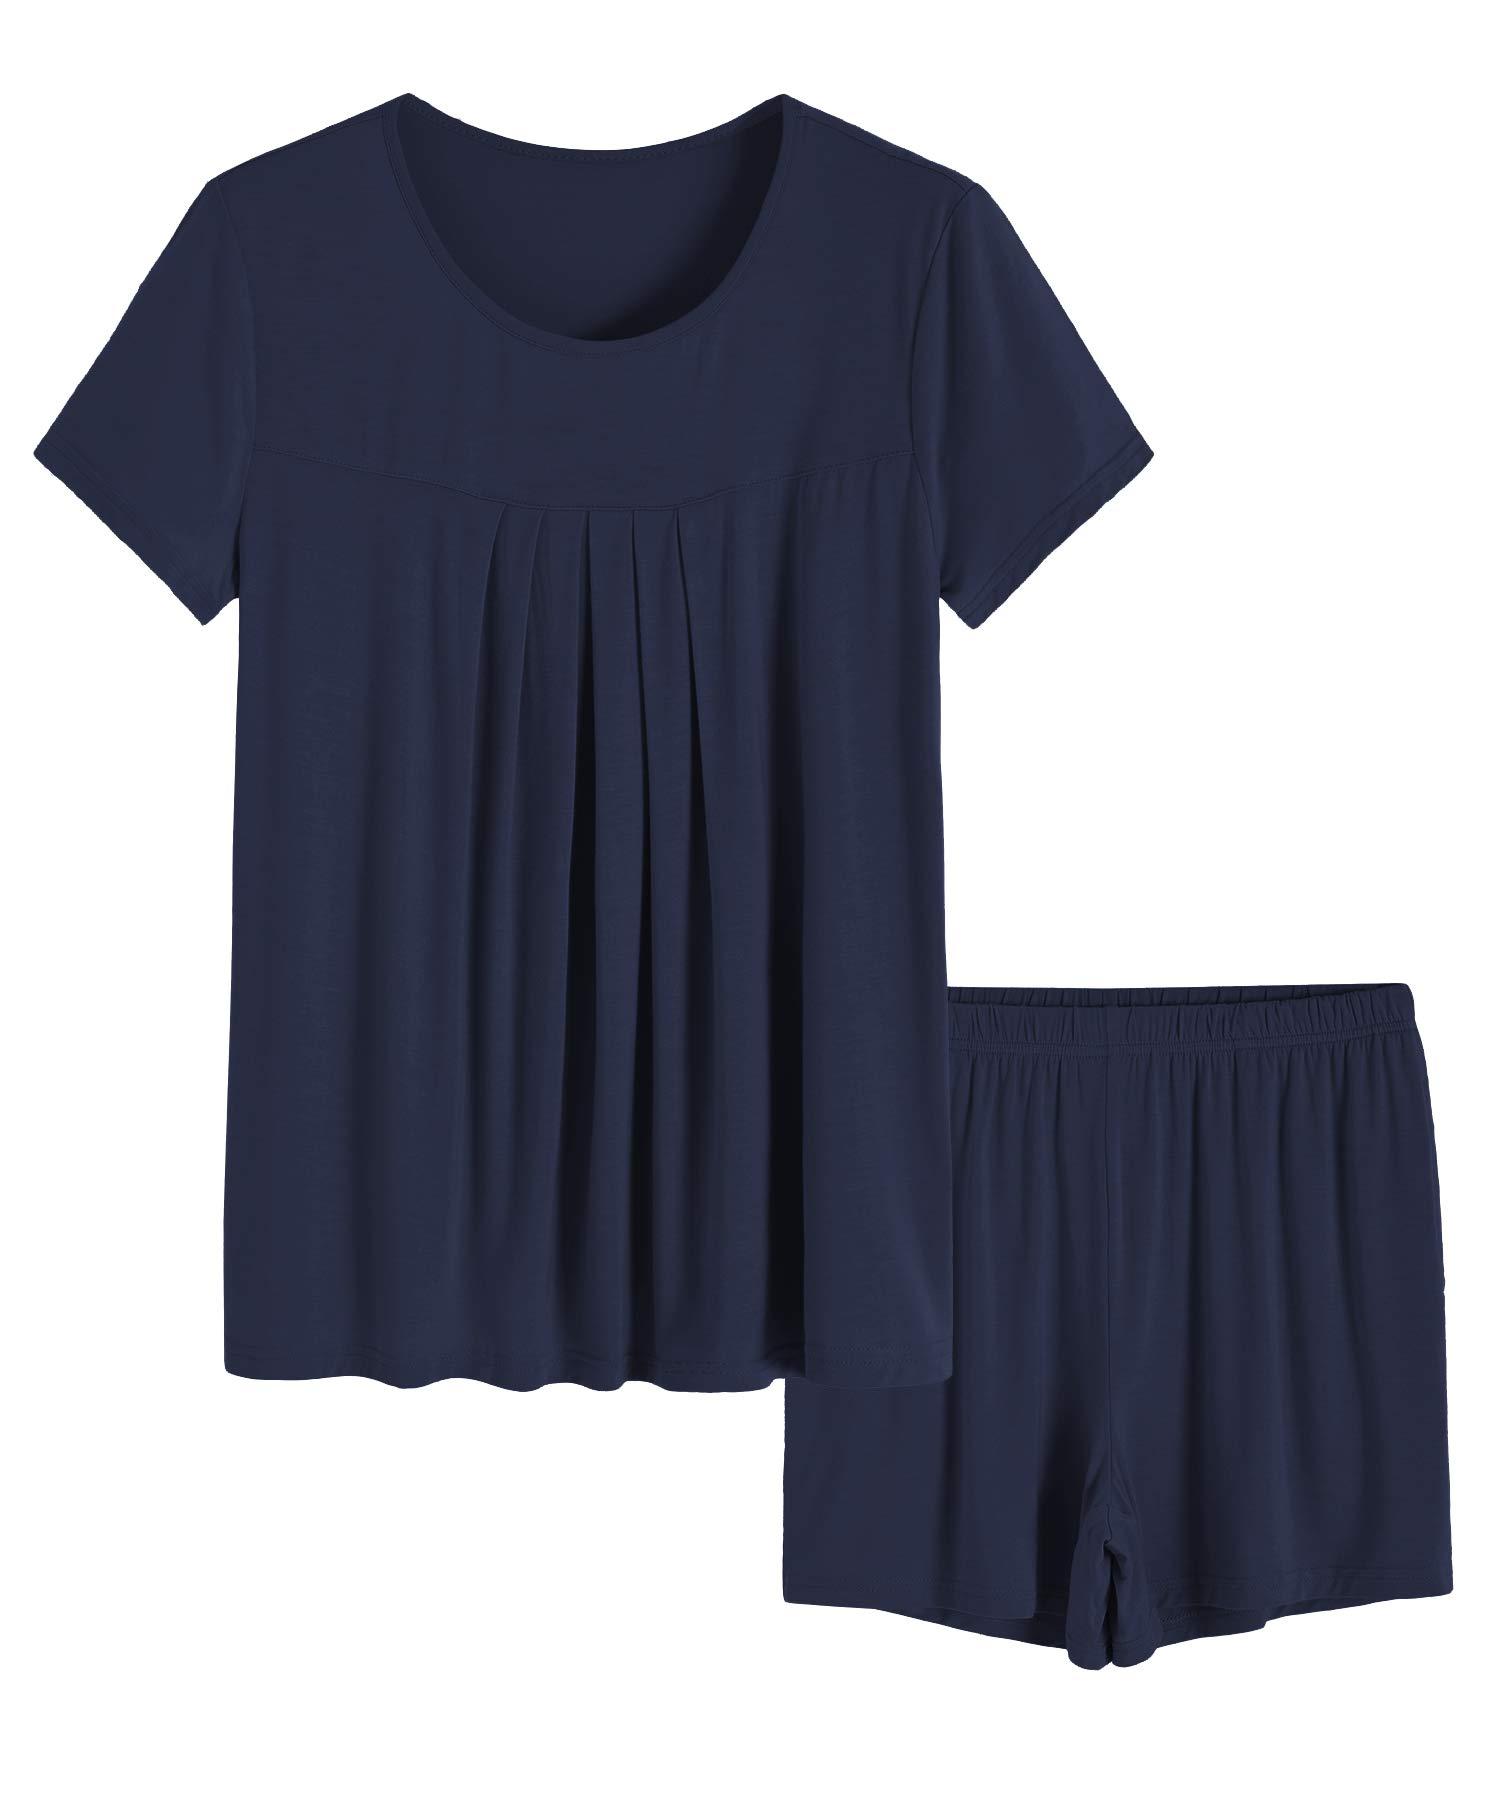 Latuza Women's Summer Pleated Top Shorts Pajamas Set with Pockets